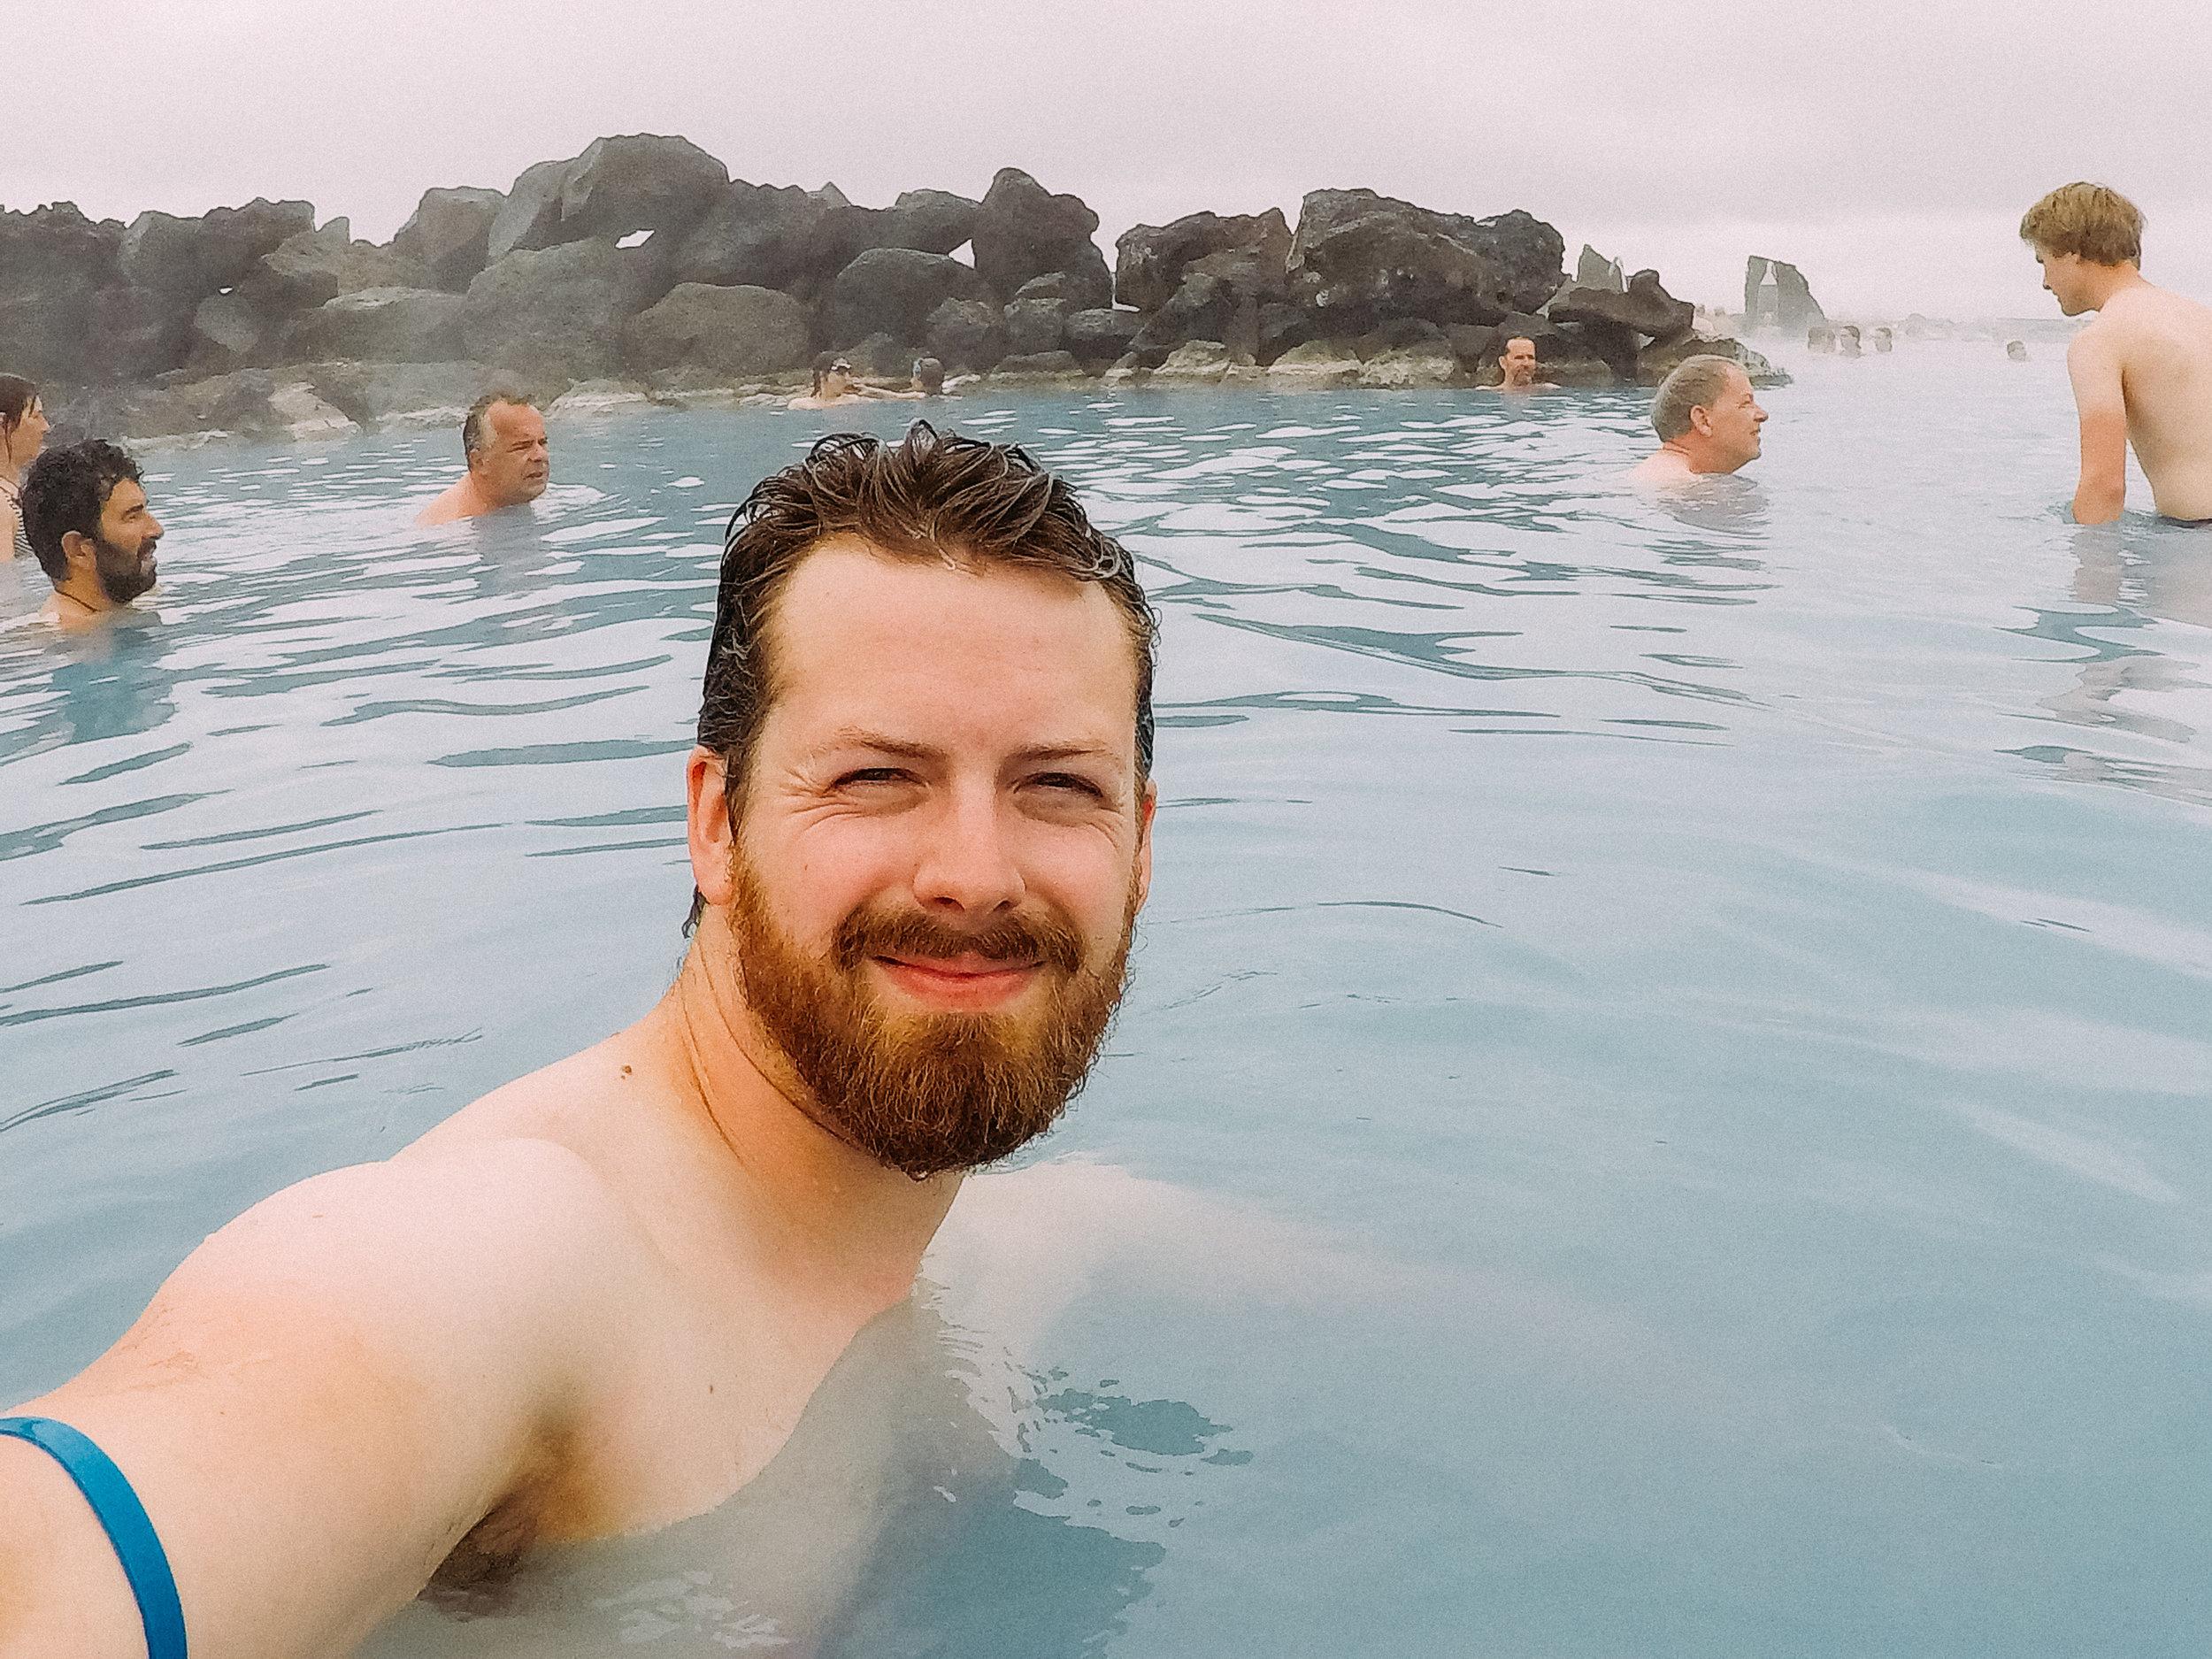 Mývatn Nature Baths  [65.6309012,-16.850162]  GoPro Hero5 Black